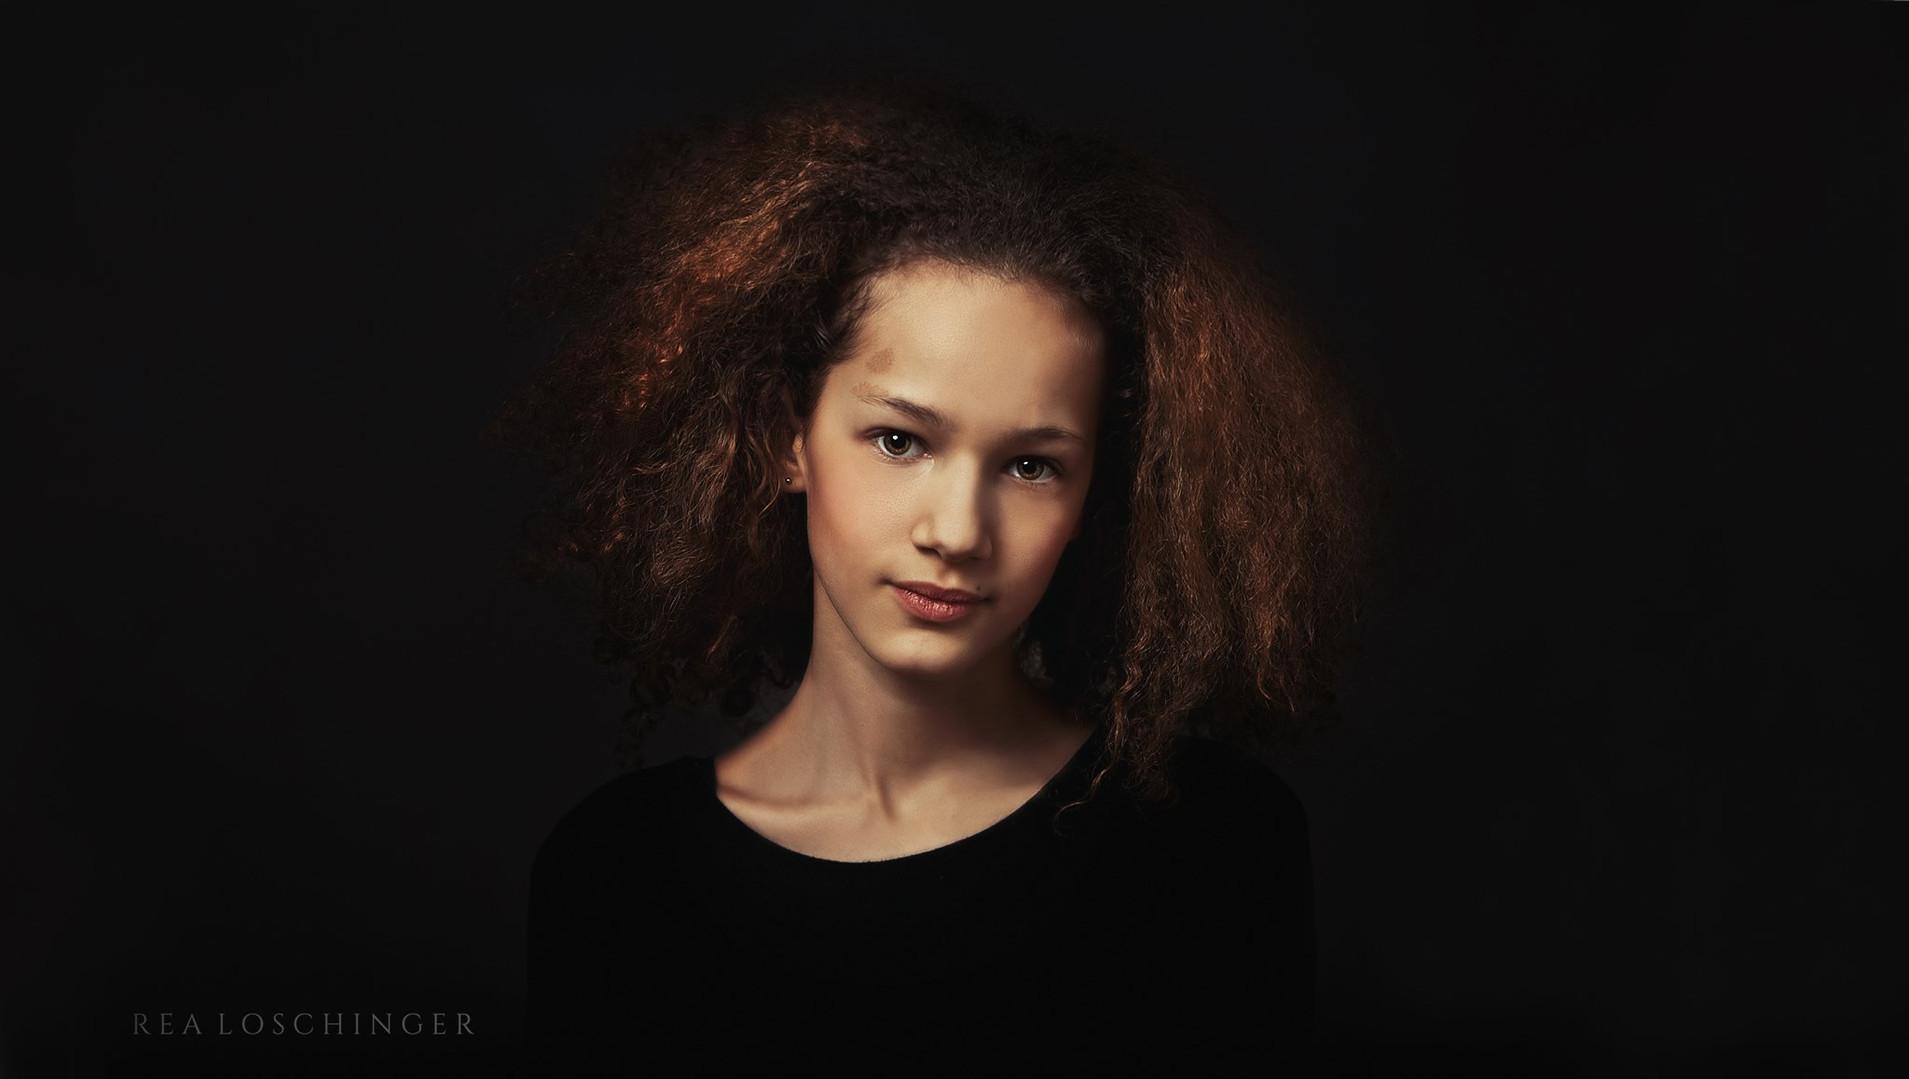 Kinderfotografie Berlin Rea Loschinger J